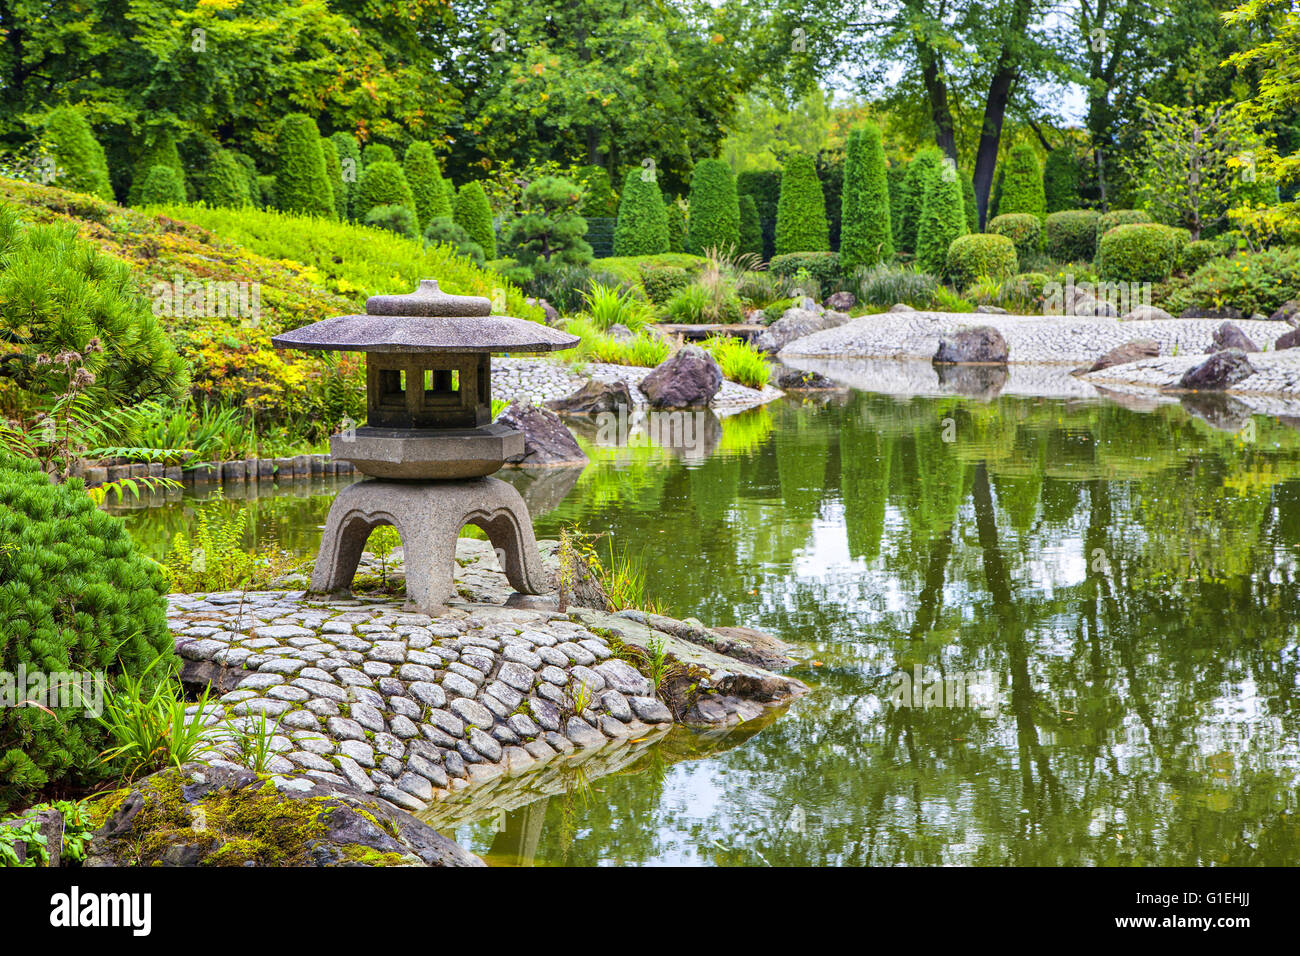 Green pond in Japanese garden in Bonn, Germany - Stock Image